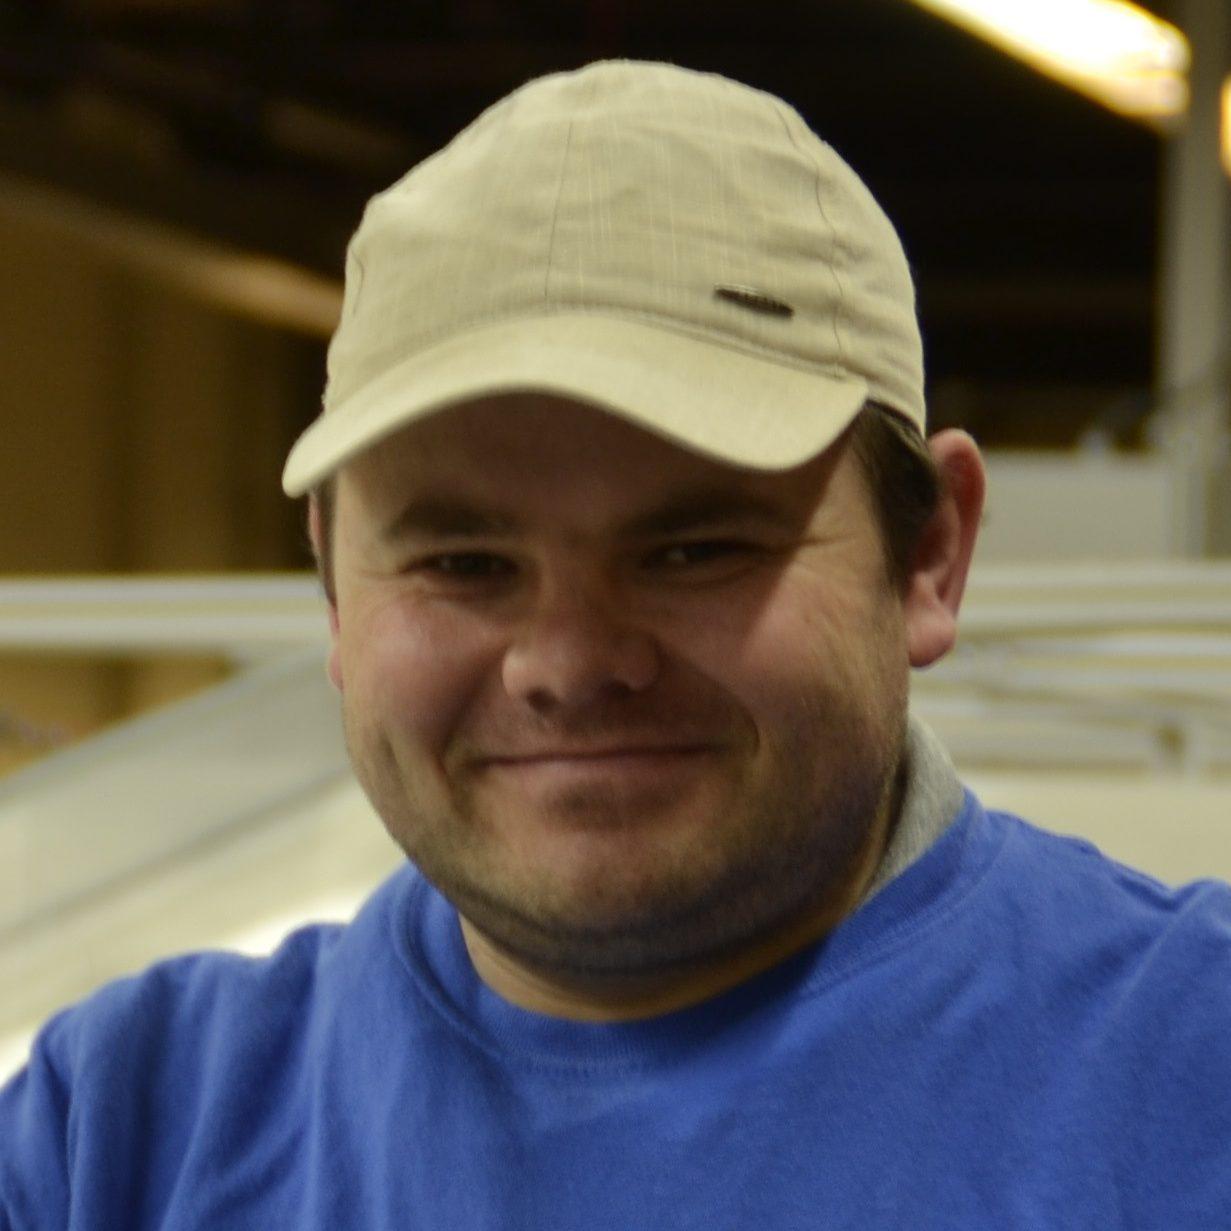 Kevin Cuylaerts, medewerker van De Kringwinkel Zuiderkempen